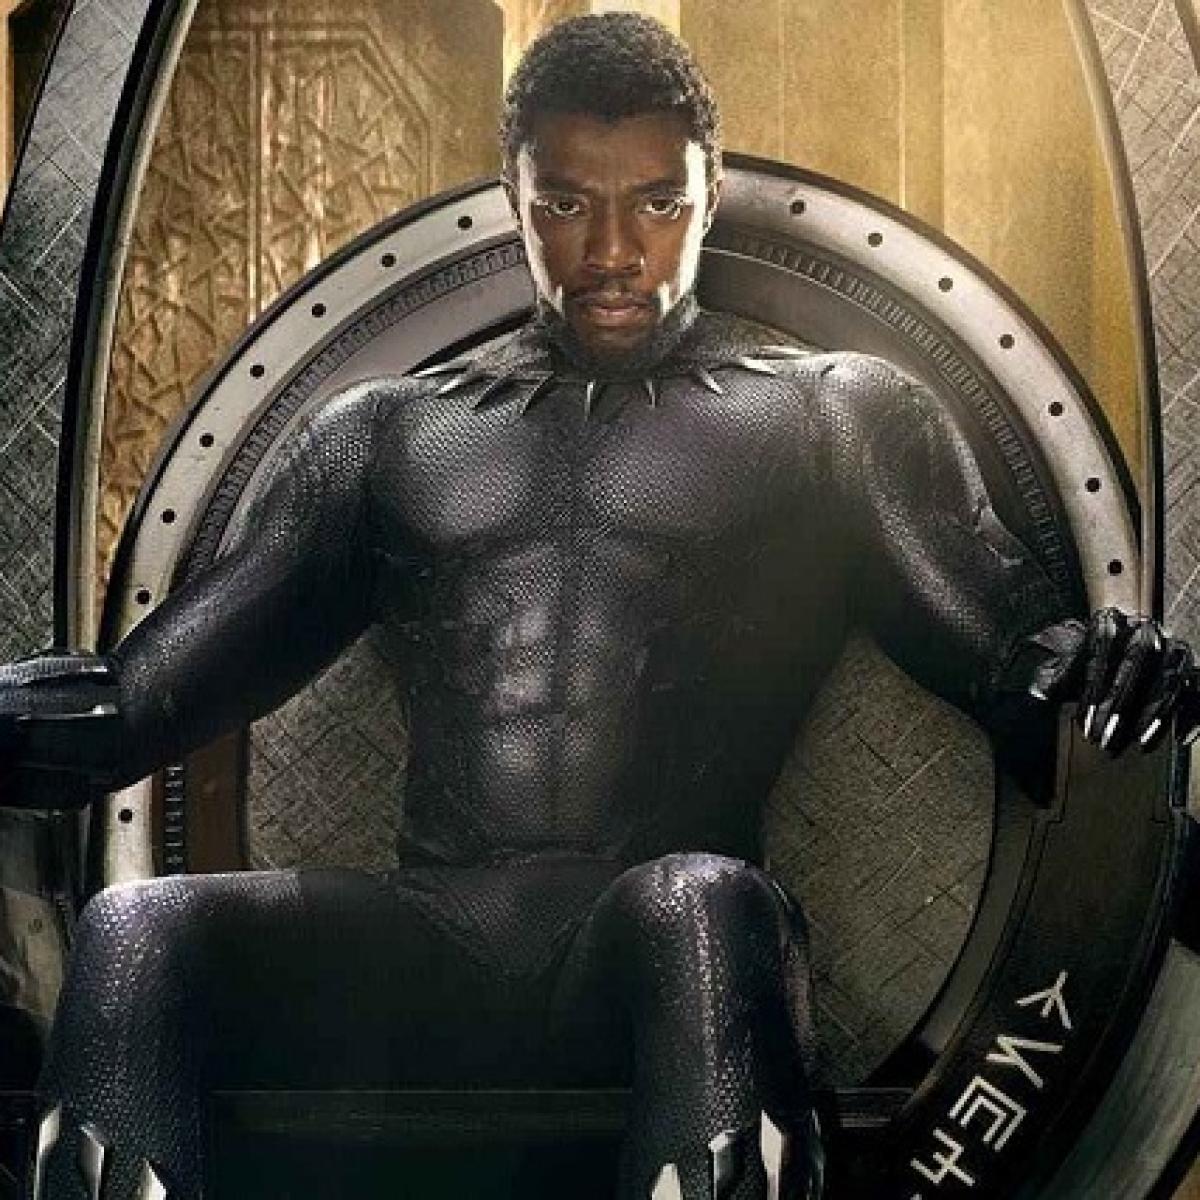 Marvel won't recast Chadwick Boseman's T'Challa in 'Black Panther' sequel